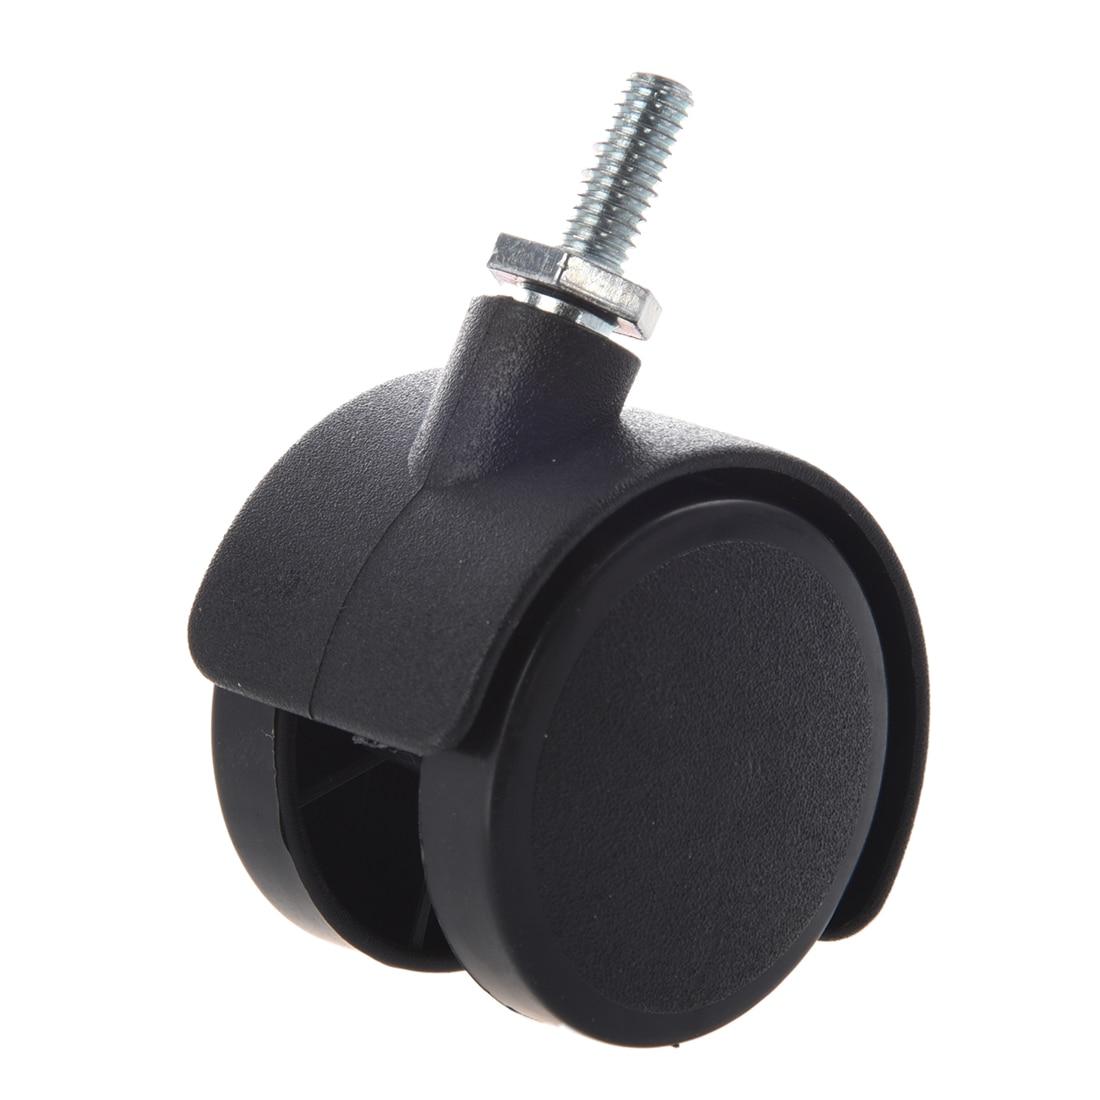 6mm Rosca Da Haste 40mm Dupla Roda Rodízio Giratório Preto